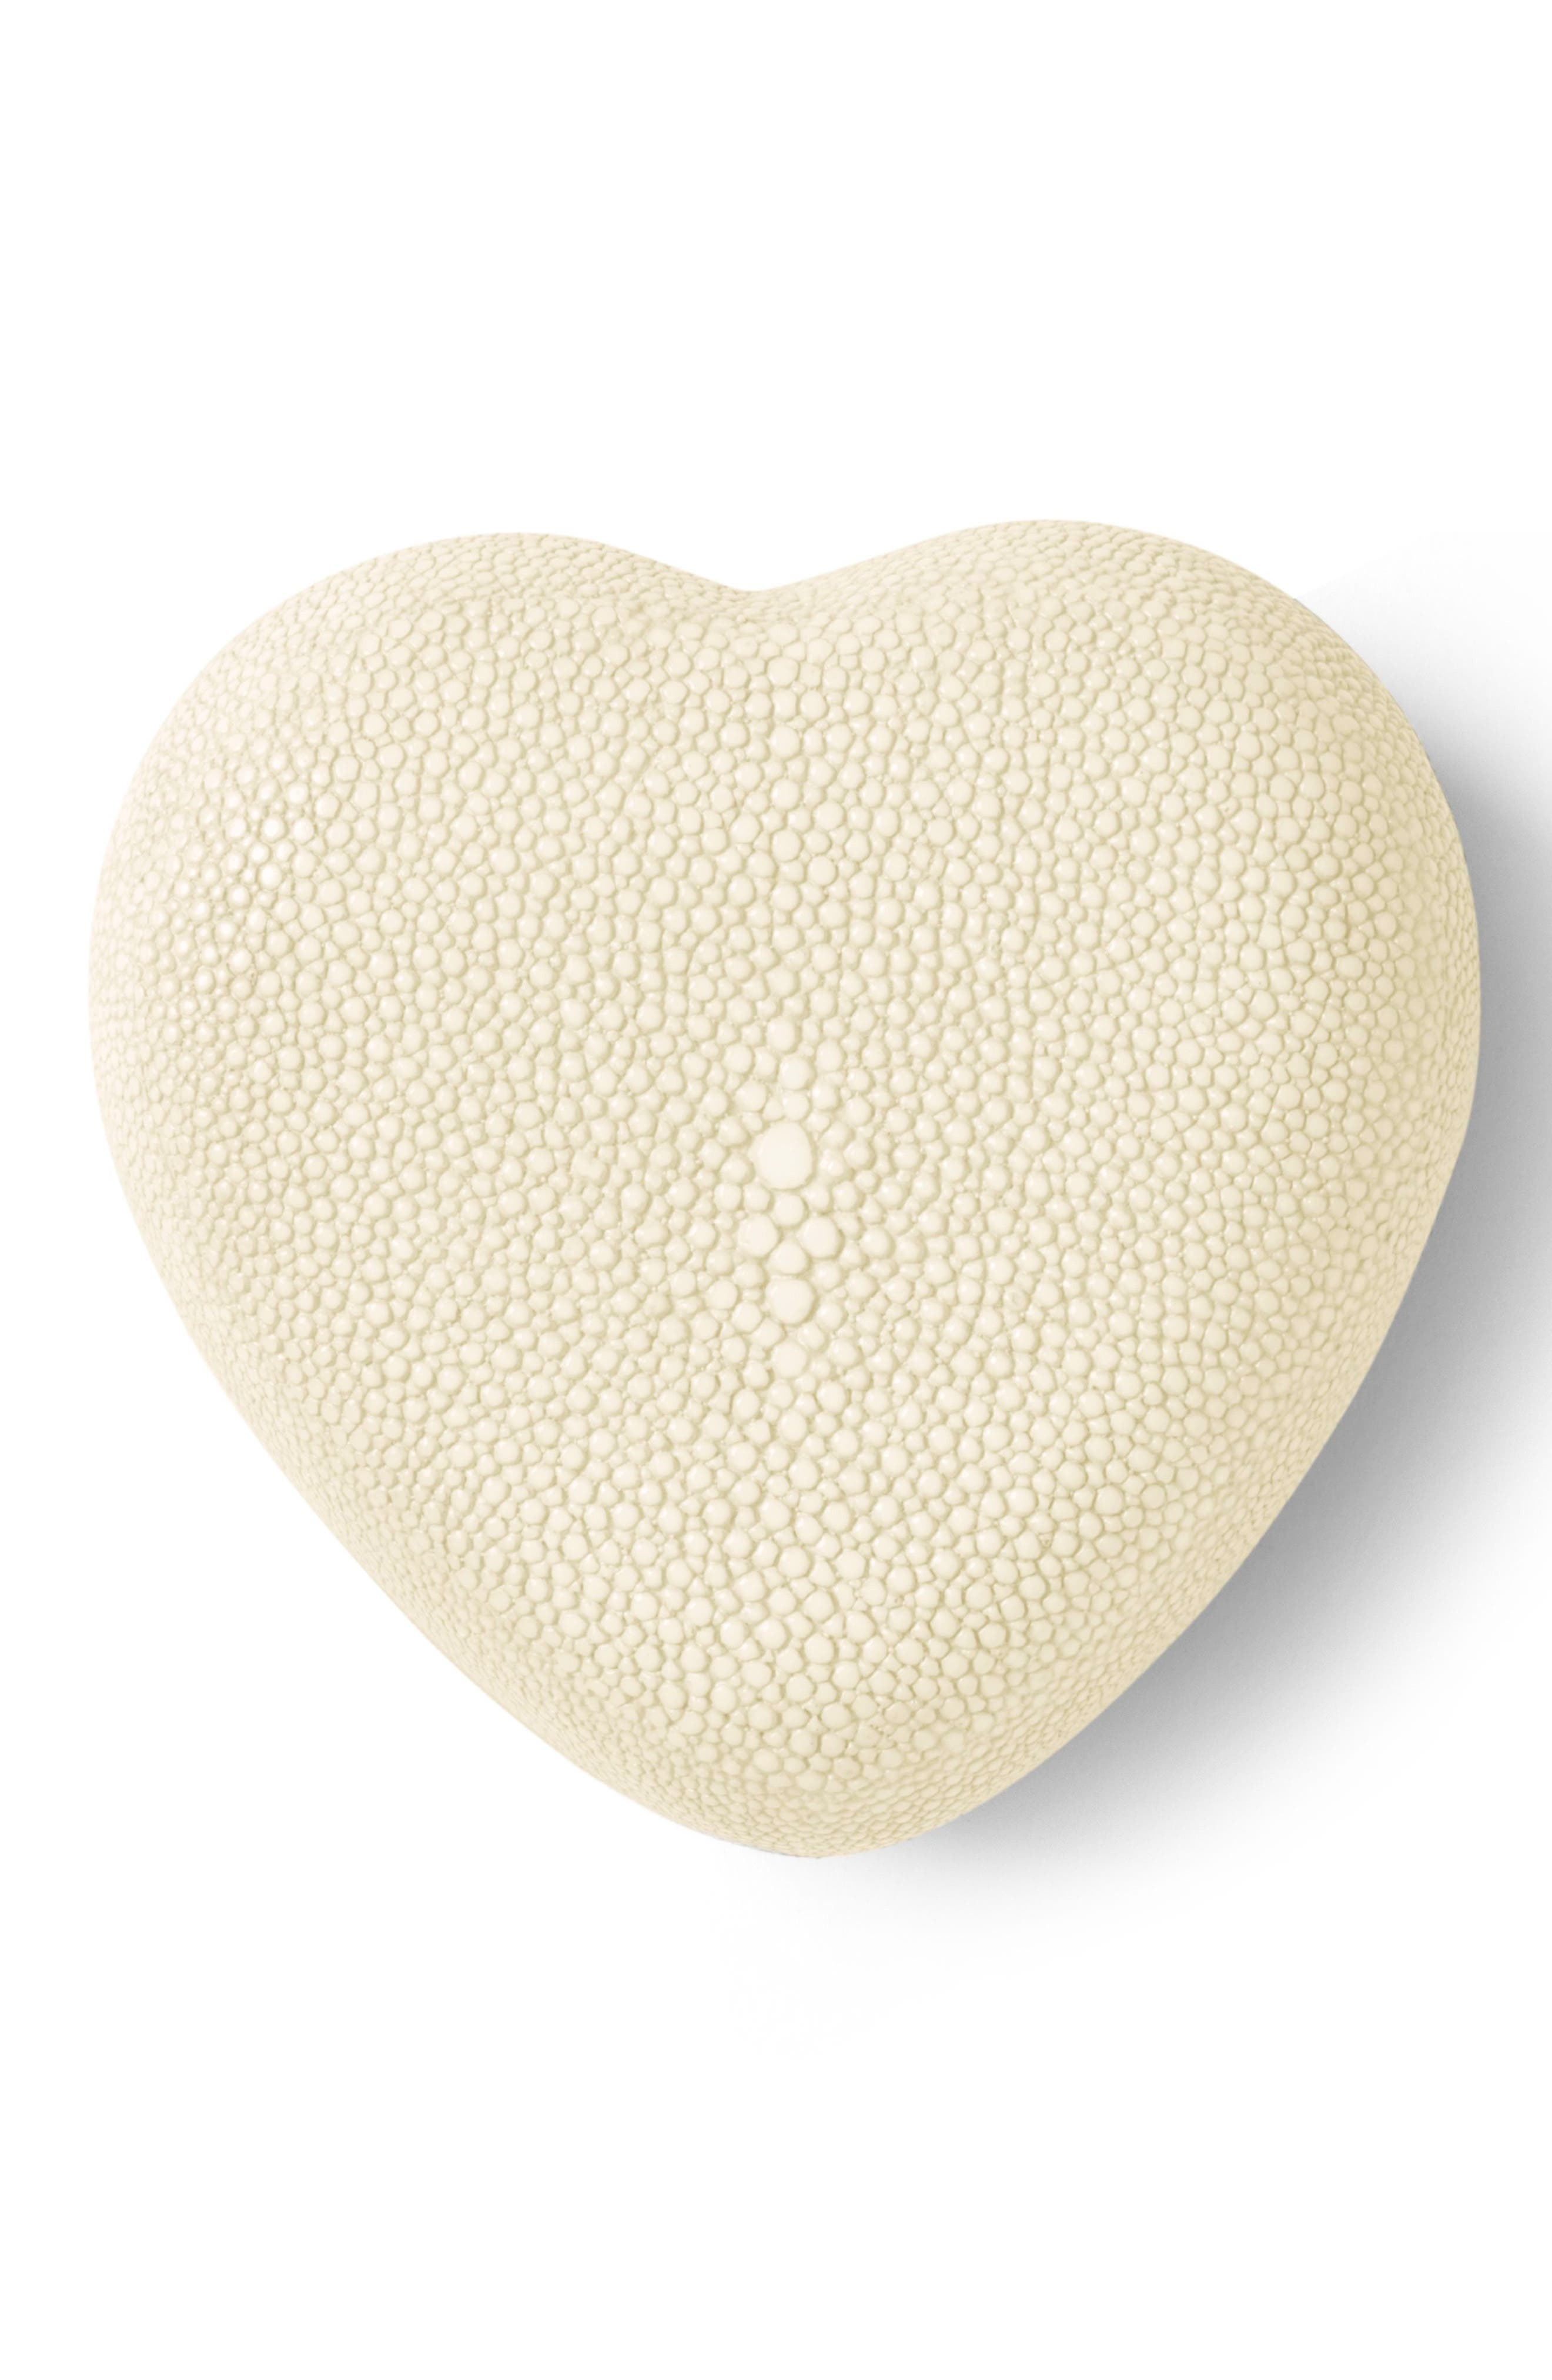 Shagreen Heart Box,                             Main thumbnail 1, color,                             Cream